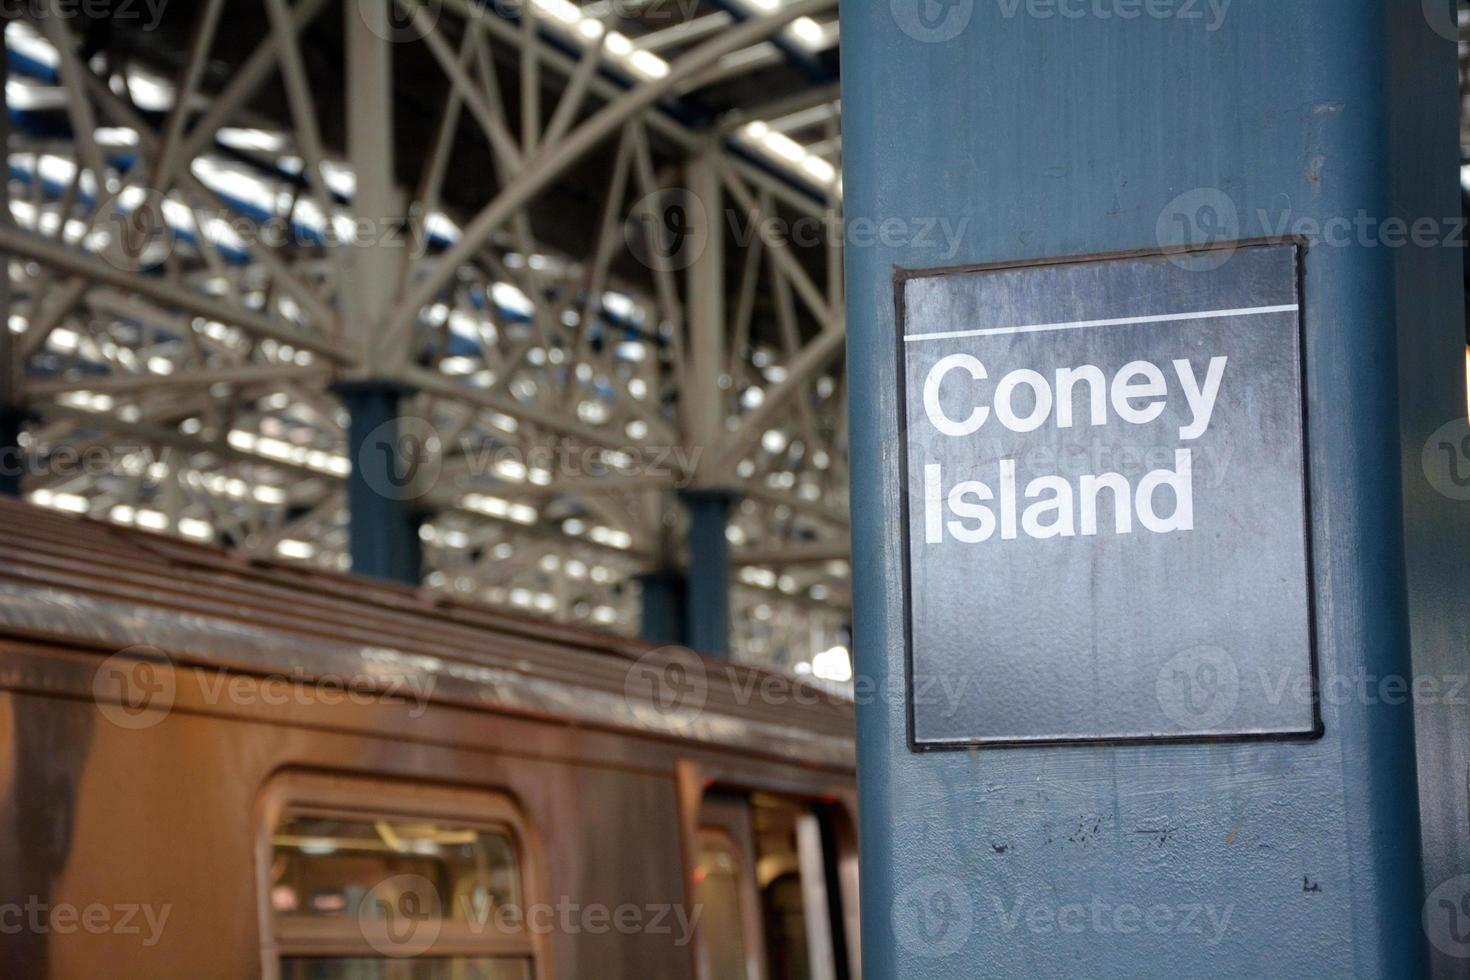 Coney Island Subway Sign photo